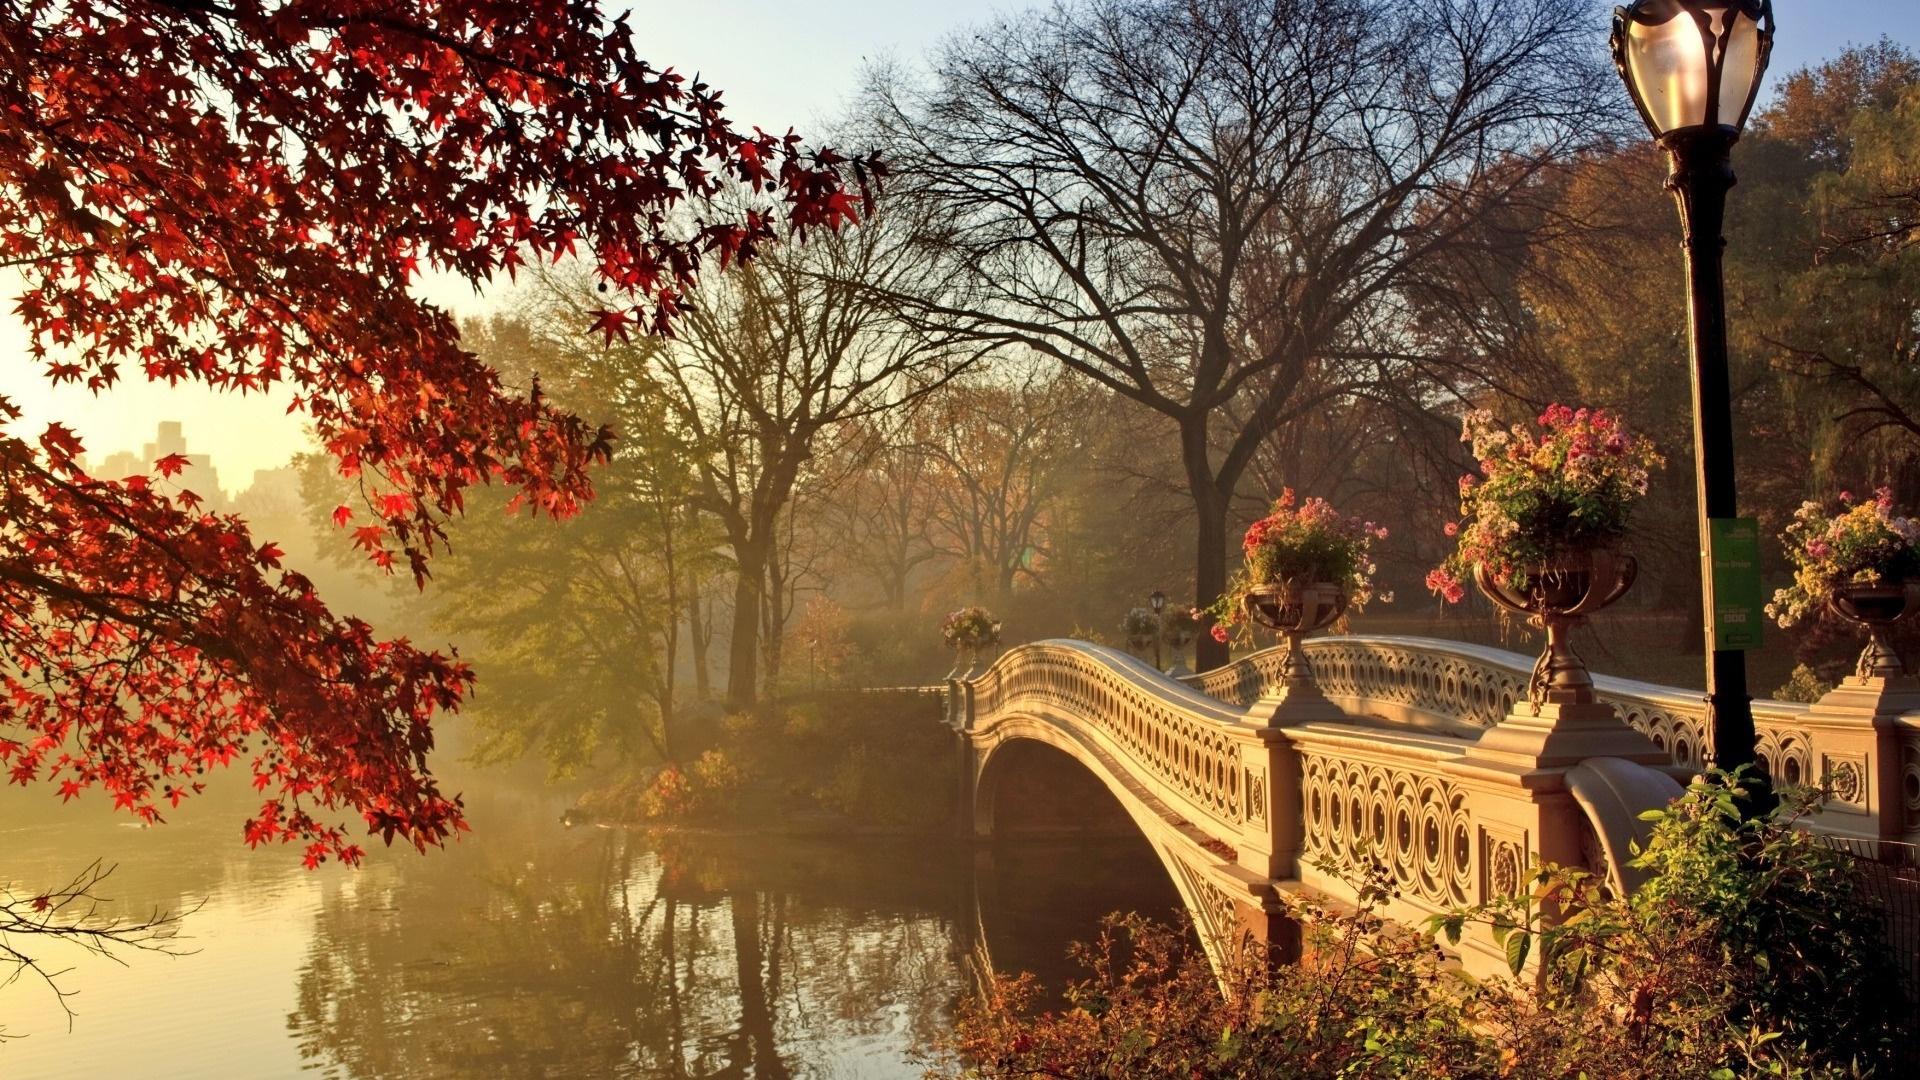 Autumn free background